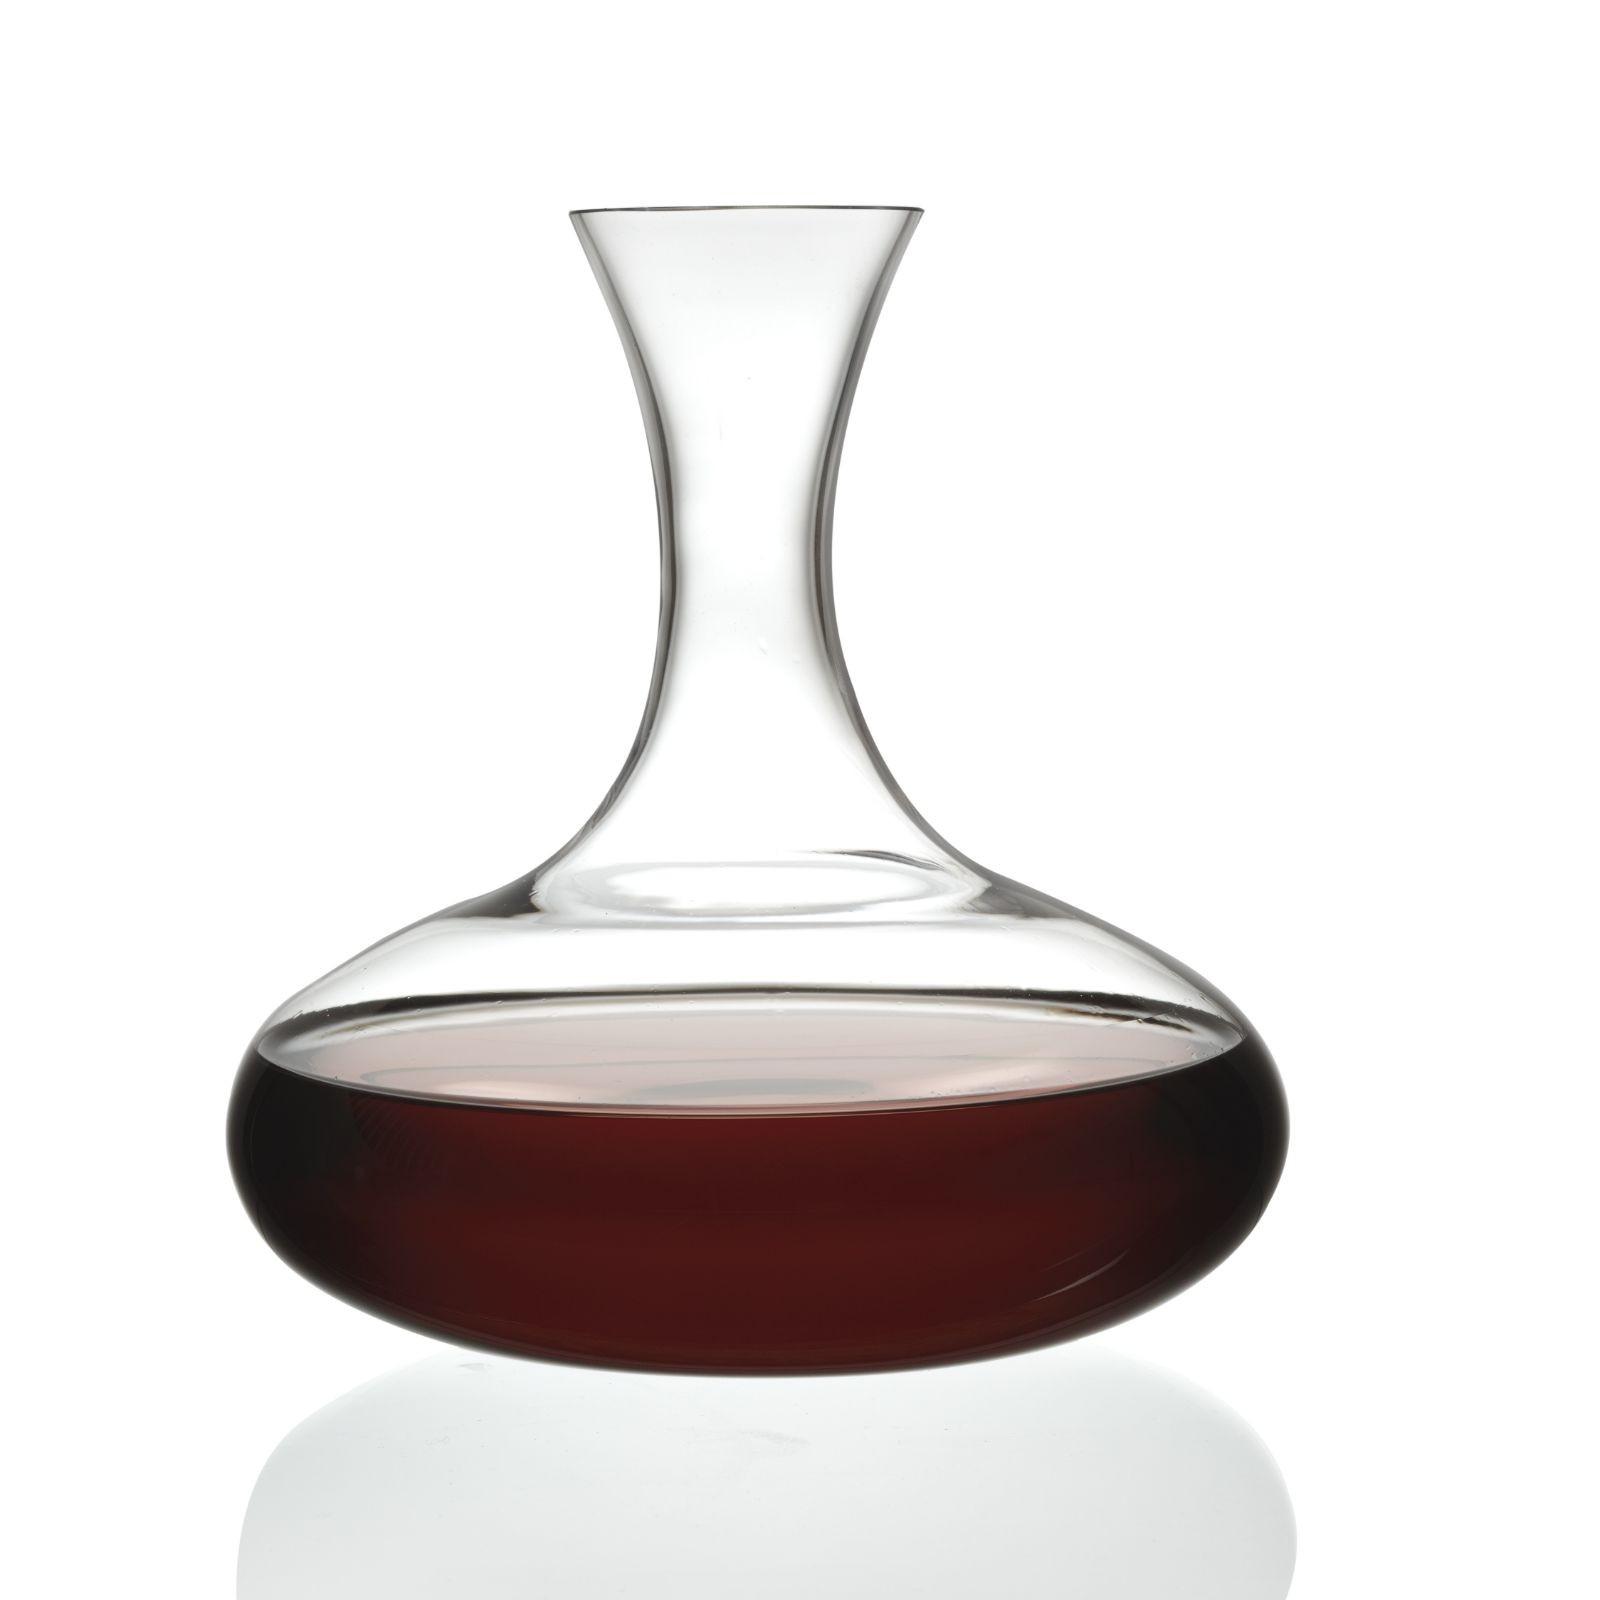 Mami XL Wine Decanter (Crystalline Glass) - Alessi